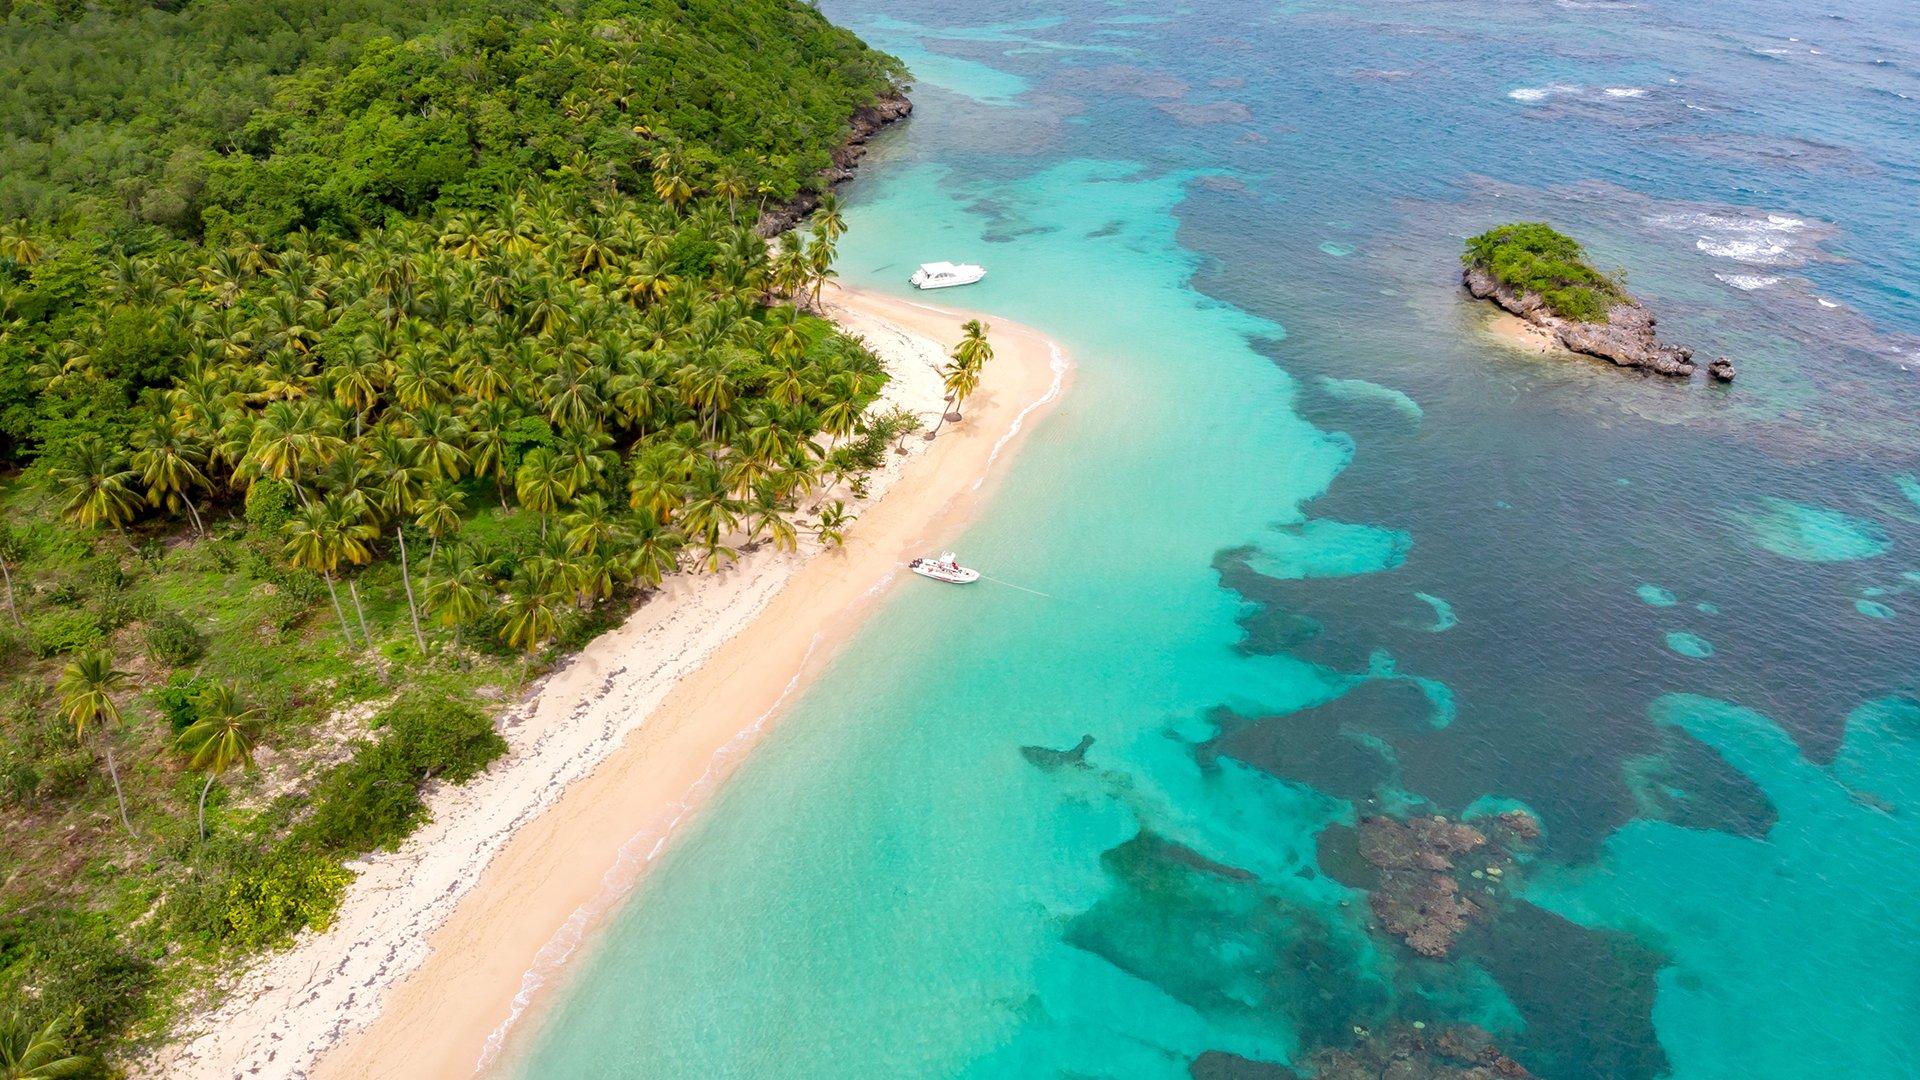 5 playas espectaculares para viajar a República Dominicana